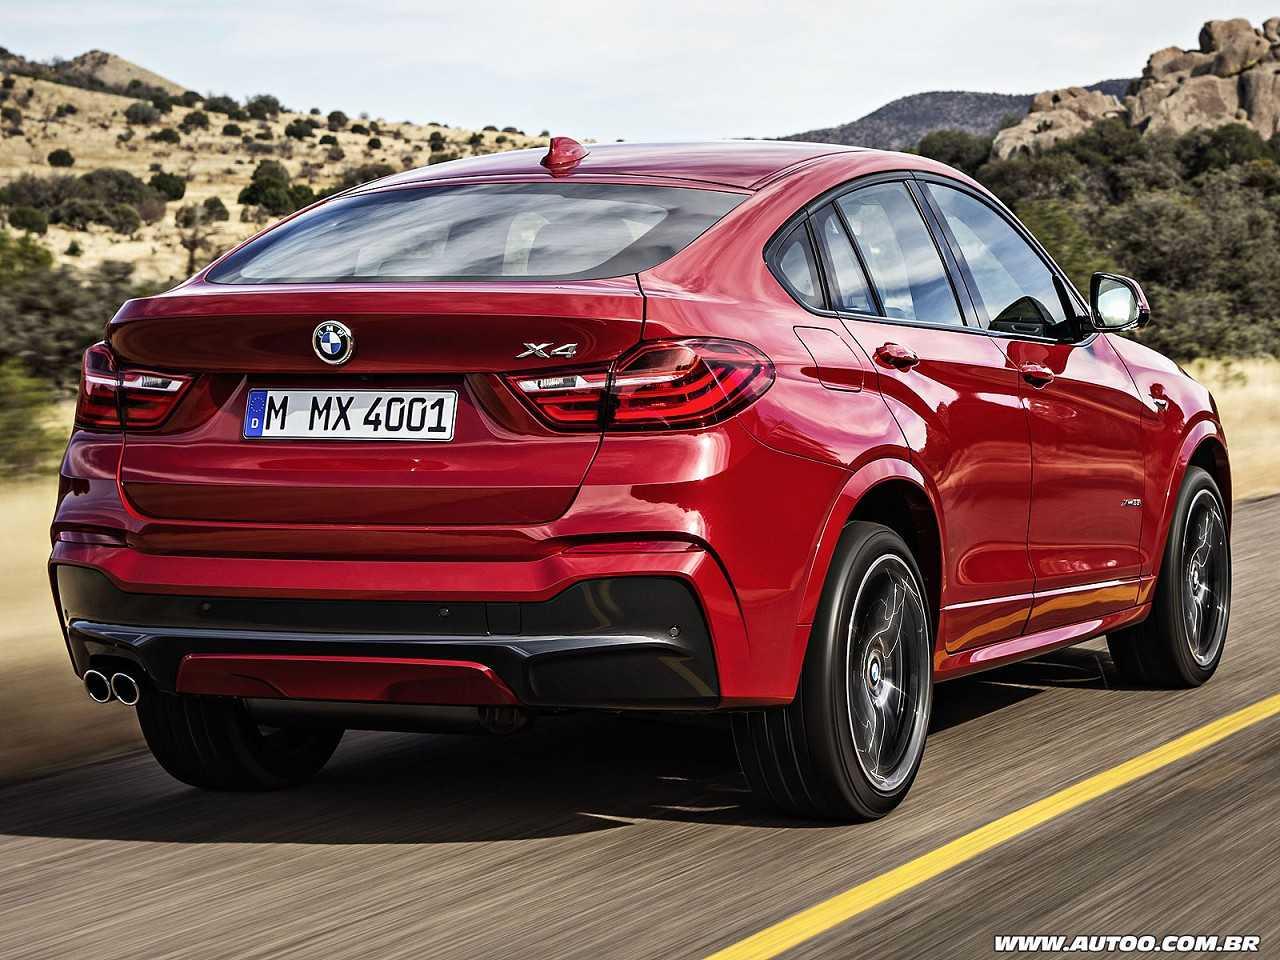 BMWX4 2016 - ângulo traseiro